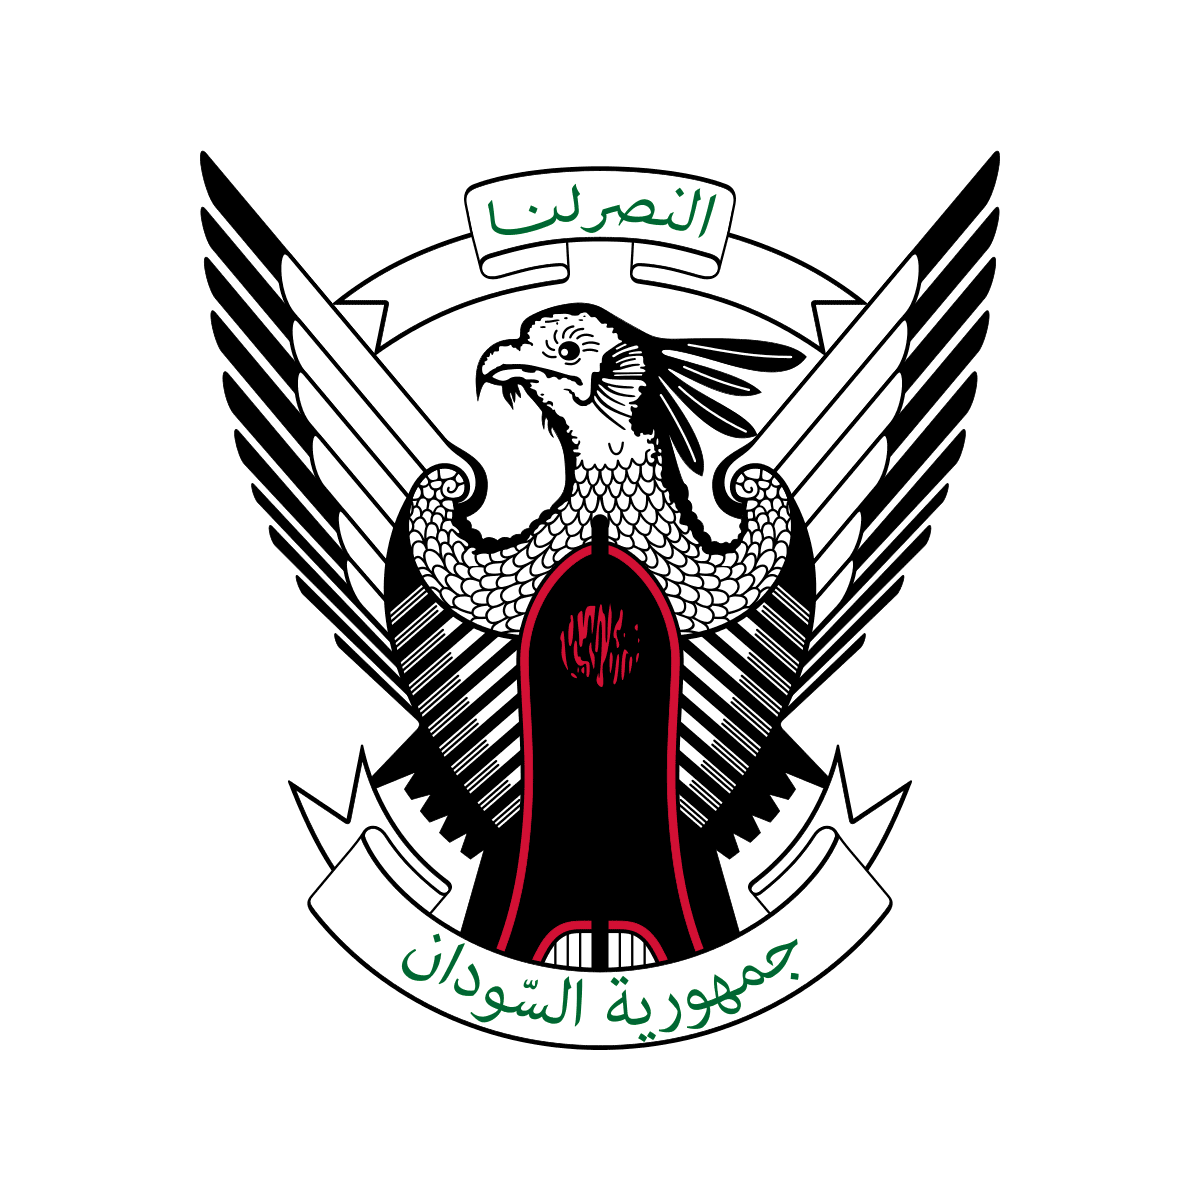 Ambasada Sudanu. Wiza do Sudanu